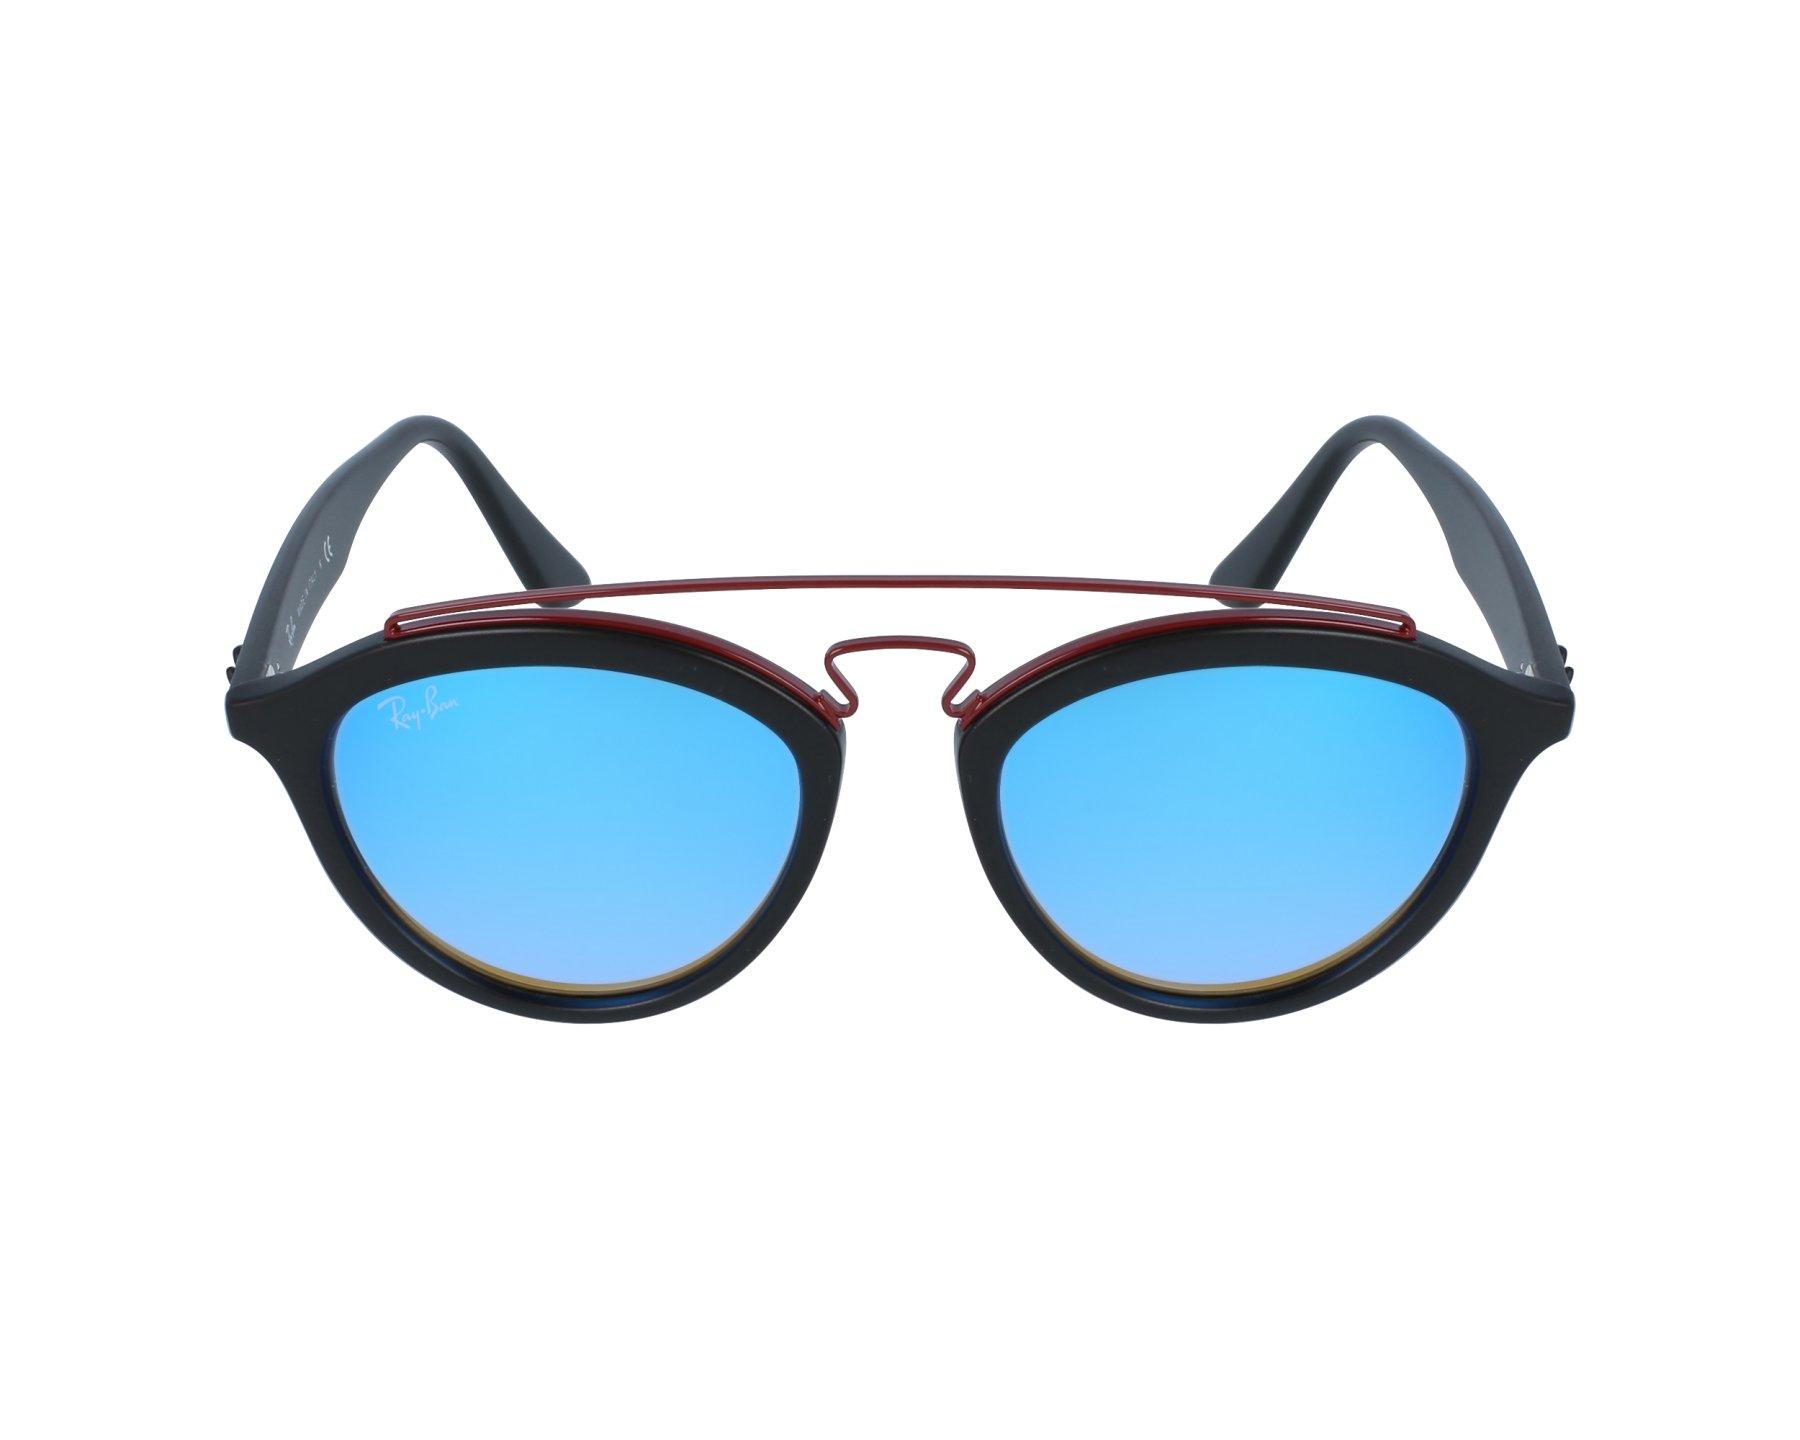 c650b5c3af6 Sunglasses Ray-Ban RB-4257 6252 B7 50-19 Black Bordeaux profile